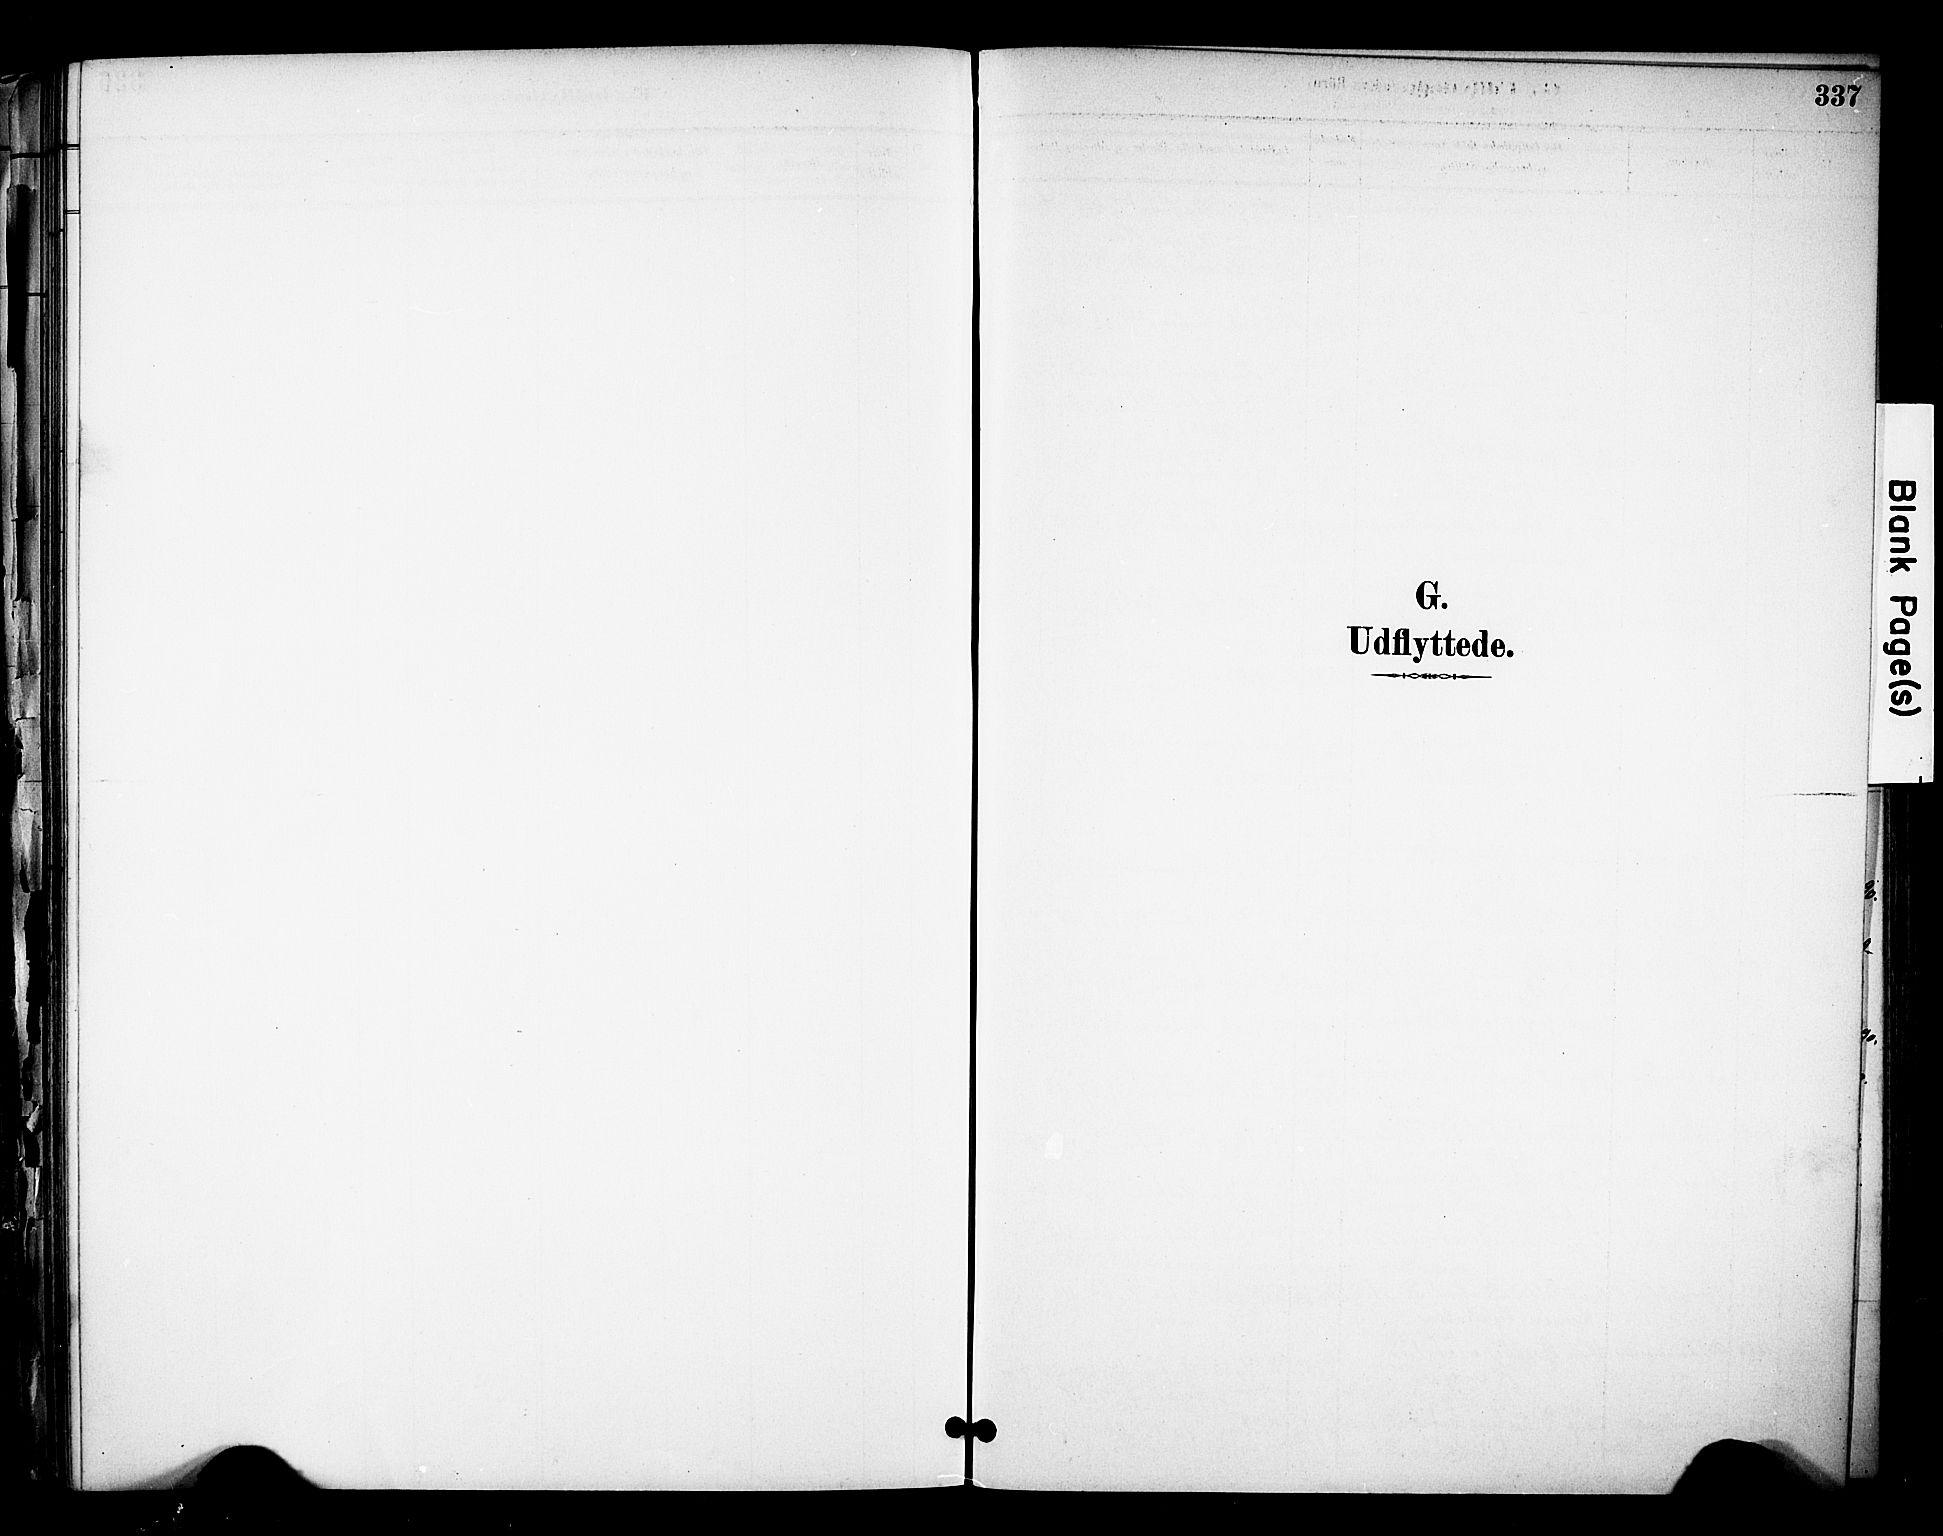 SAKO, Solum kirkebøker, F/Fa/L0010: Ministerialbok nr. I 10, 1888-1898, s. 337